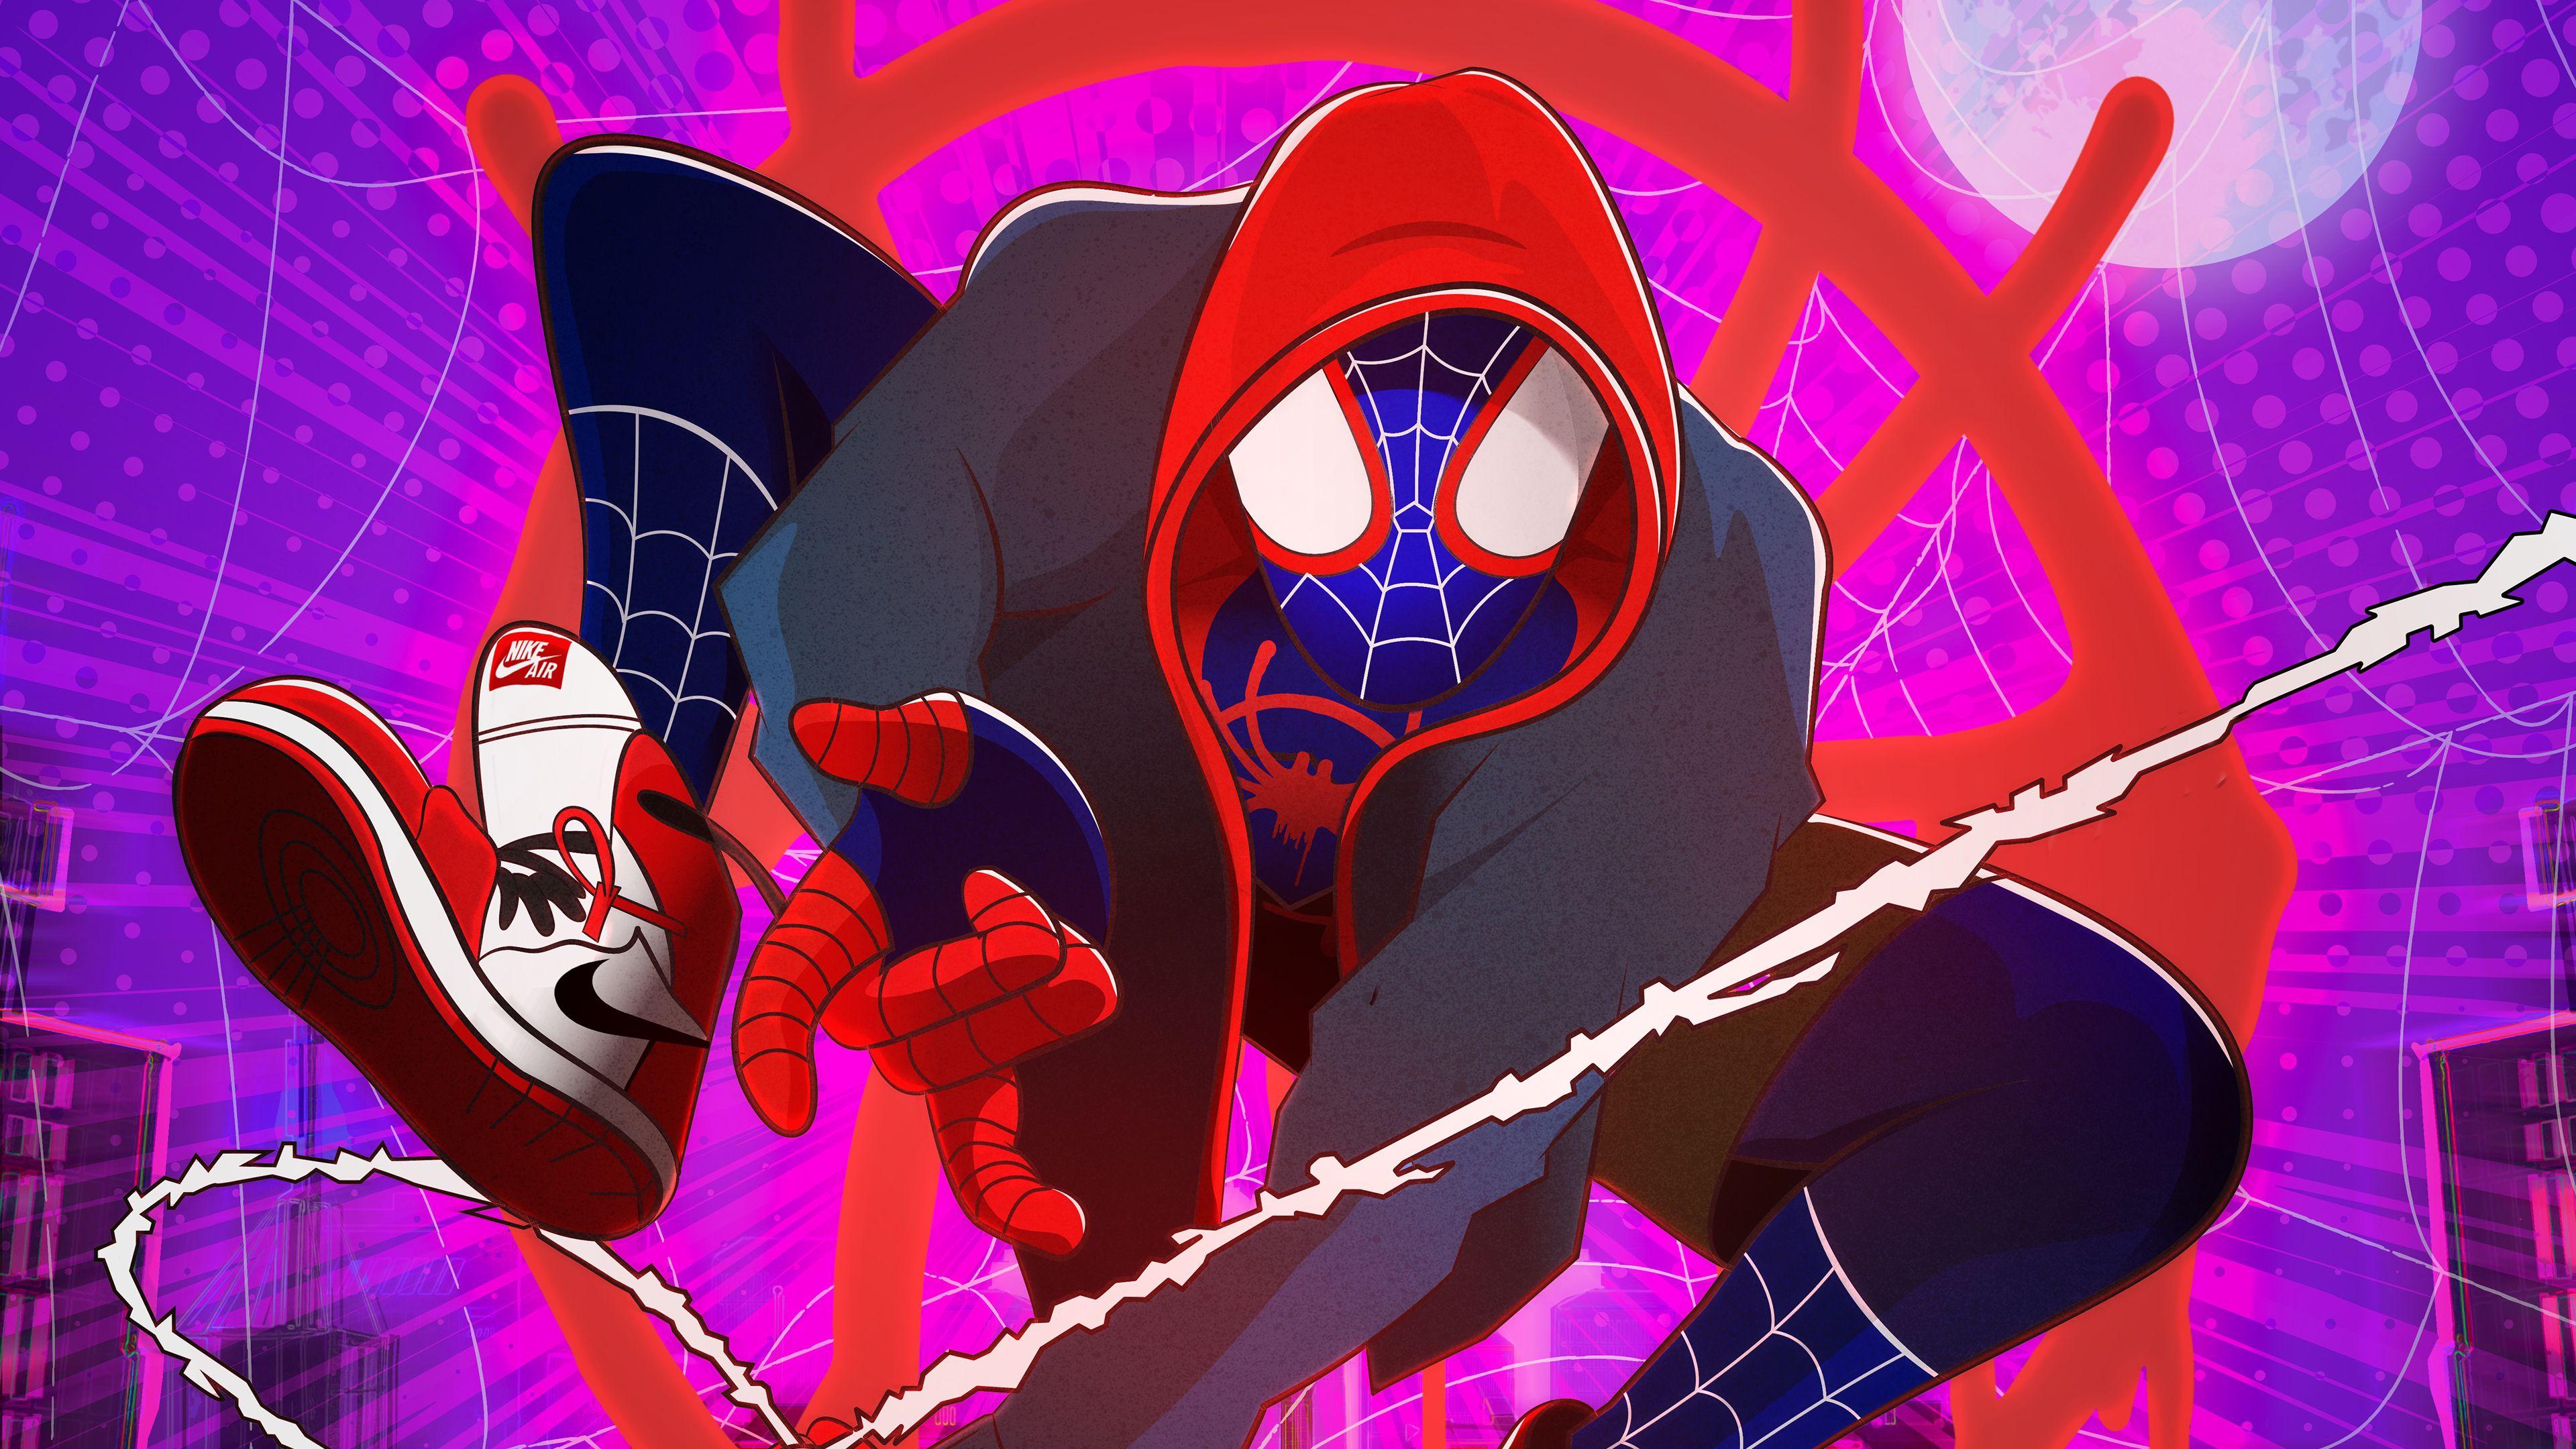 Spiderman Graphic Design Artwork 4k Superheroes Wallpapers Spiderman Wallpapers Spiderman Into The Spider Verse Wallpape Spiderman Spider Verse Art Wallpaper